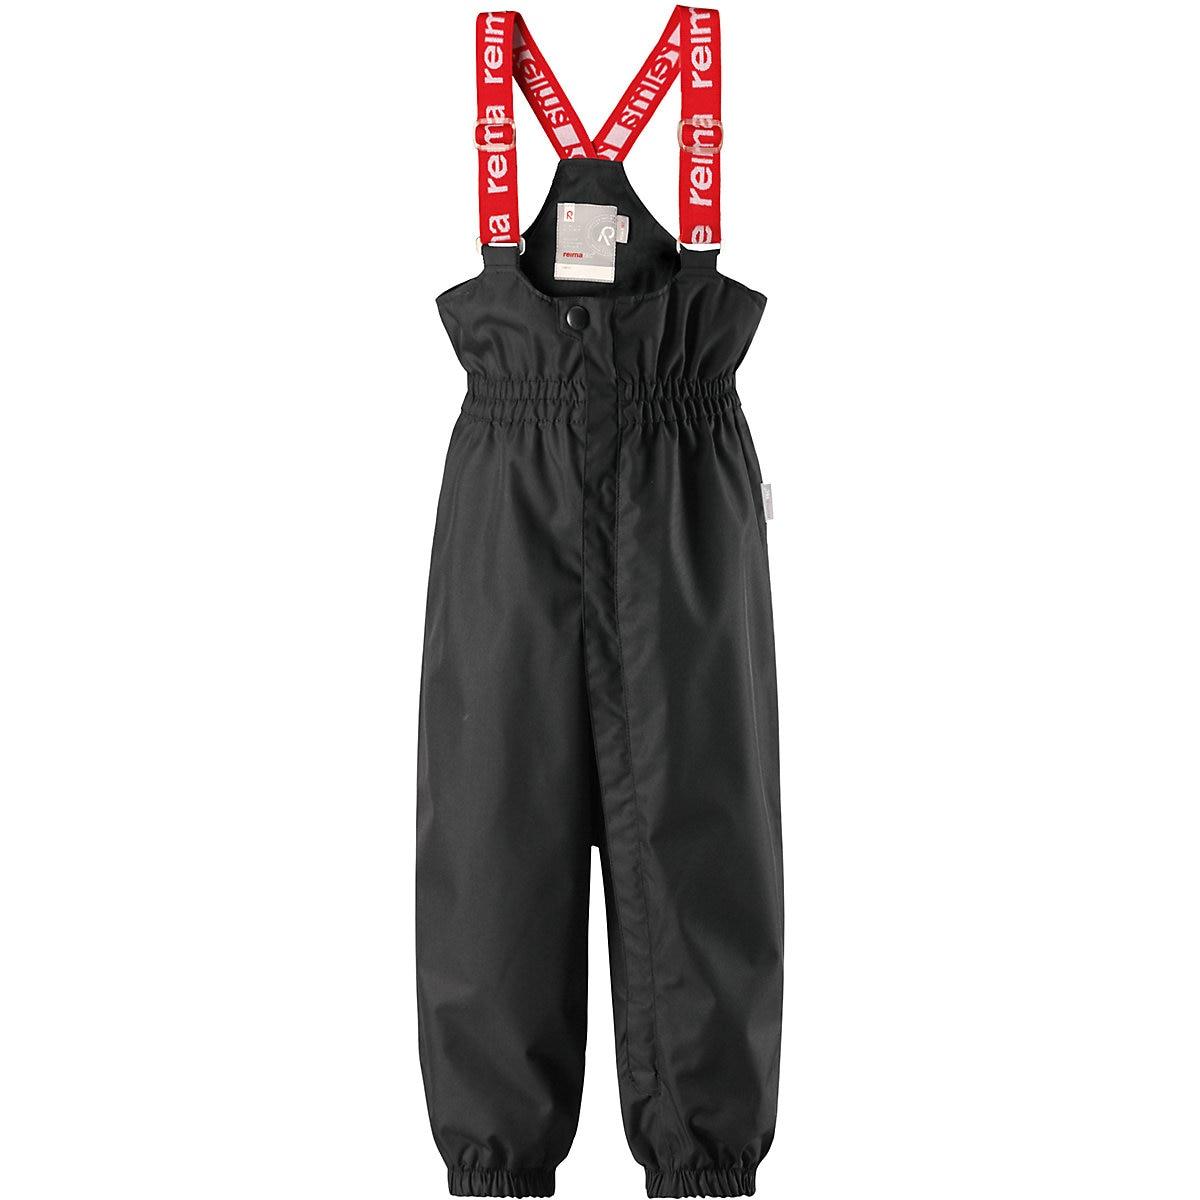 Pants & Capris Reima 7628328 for boys and girls polyester autumn winter bomhcs cute women autumn winter 100